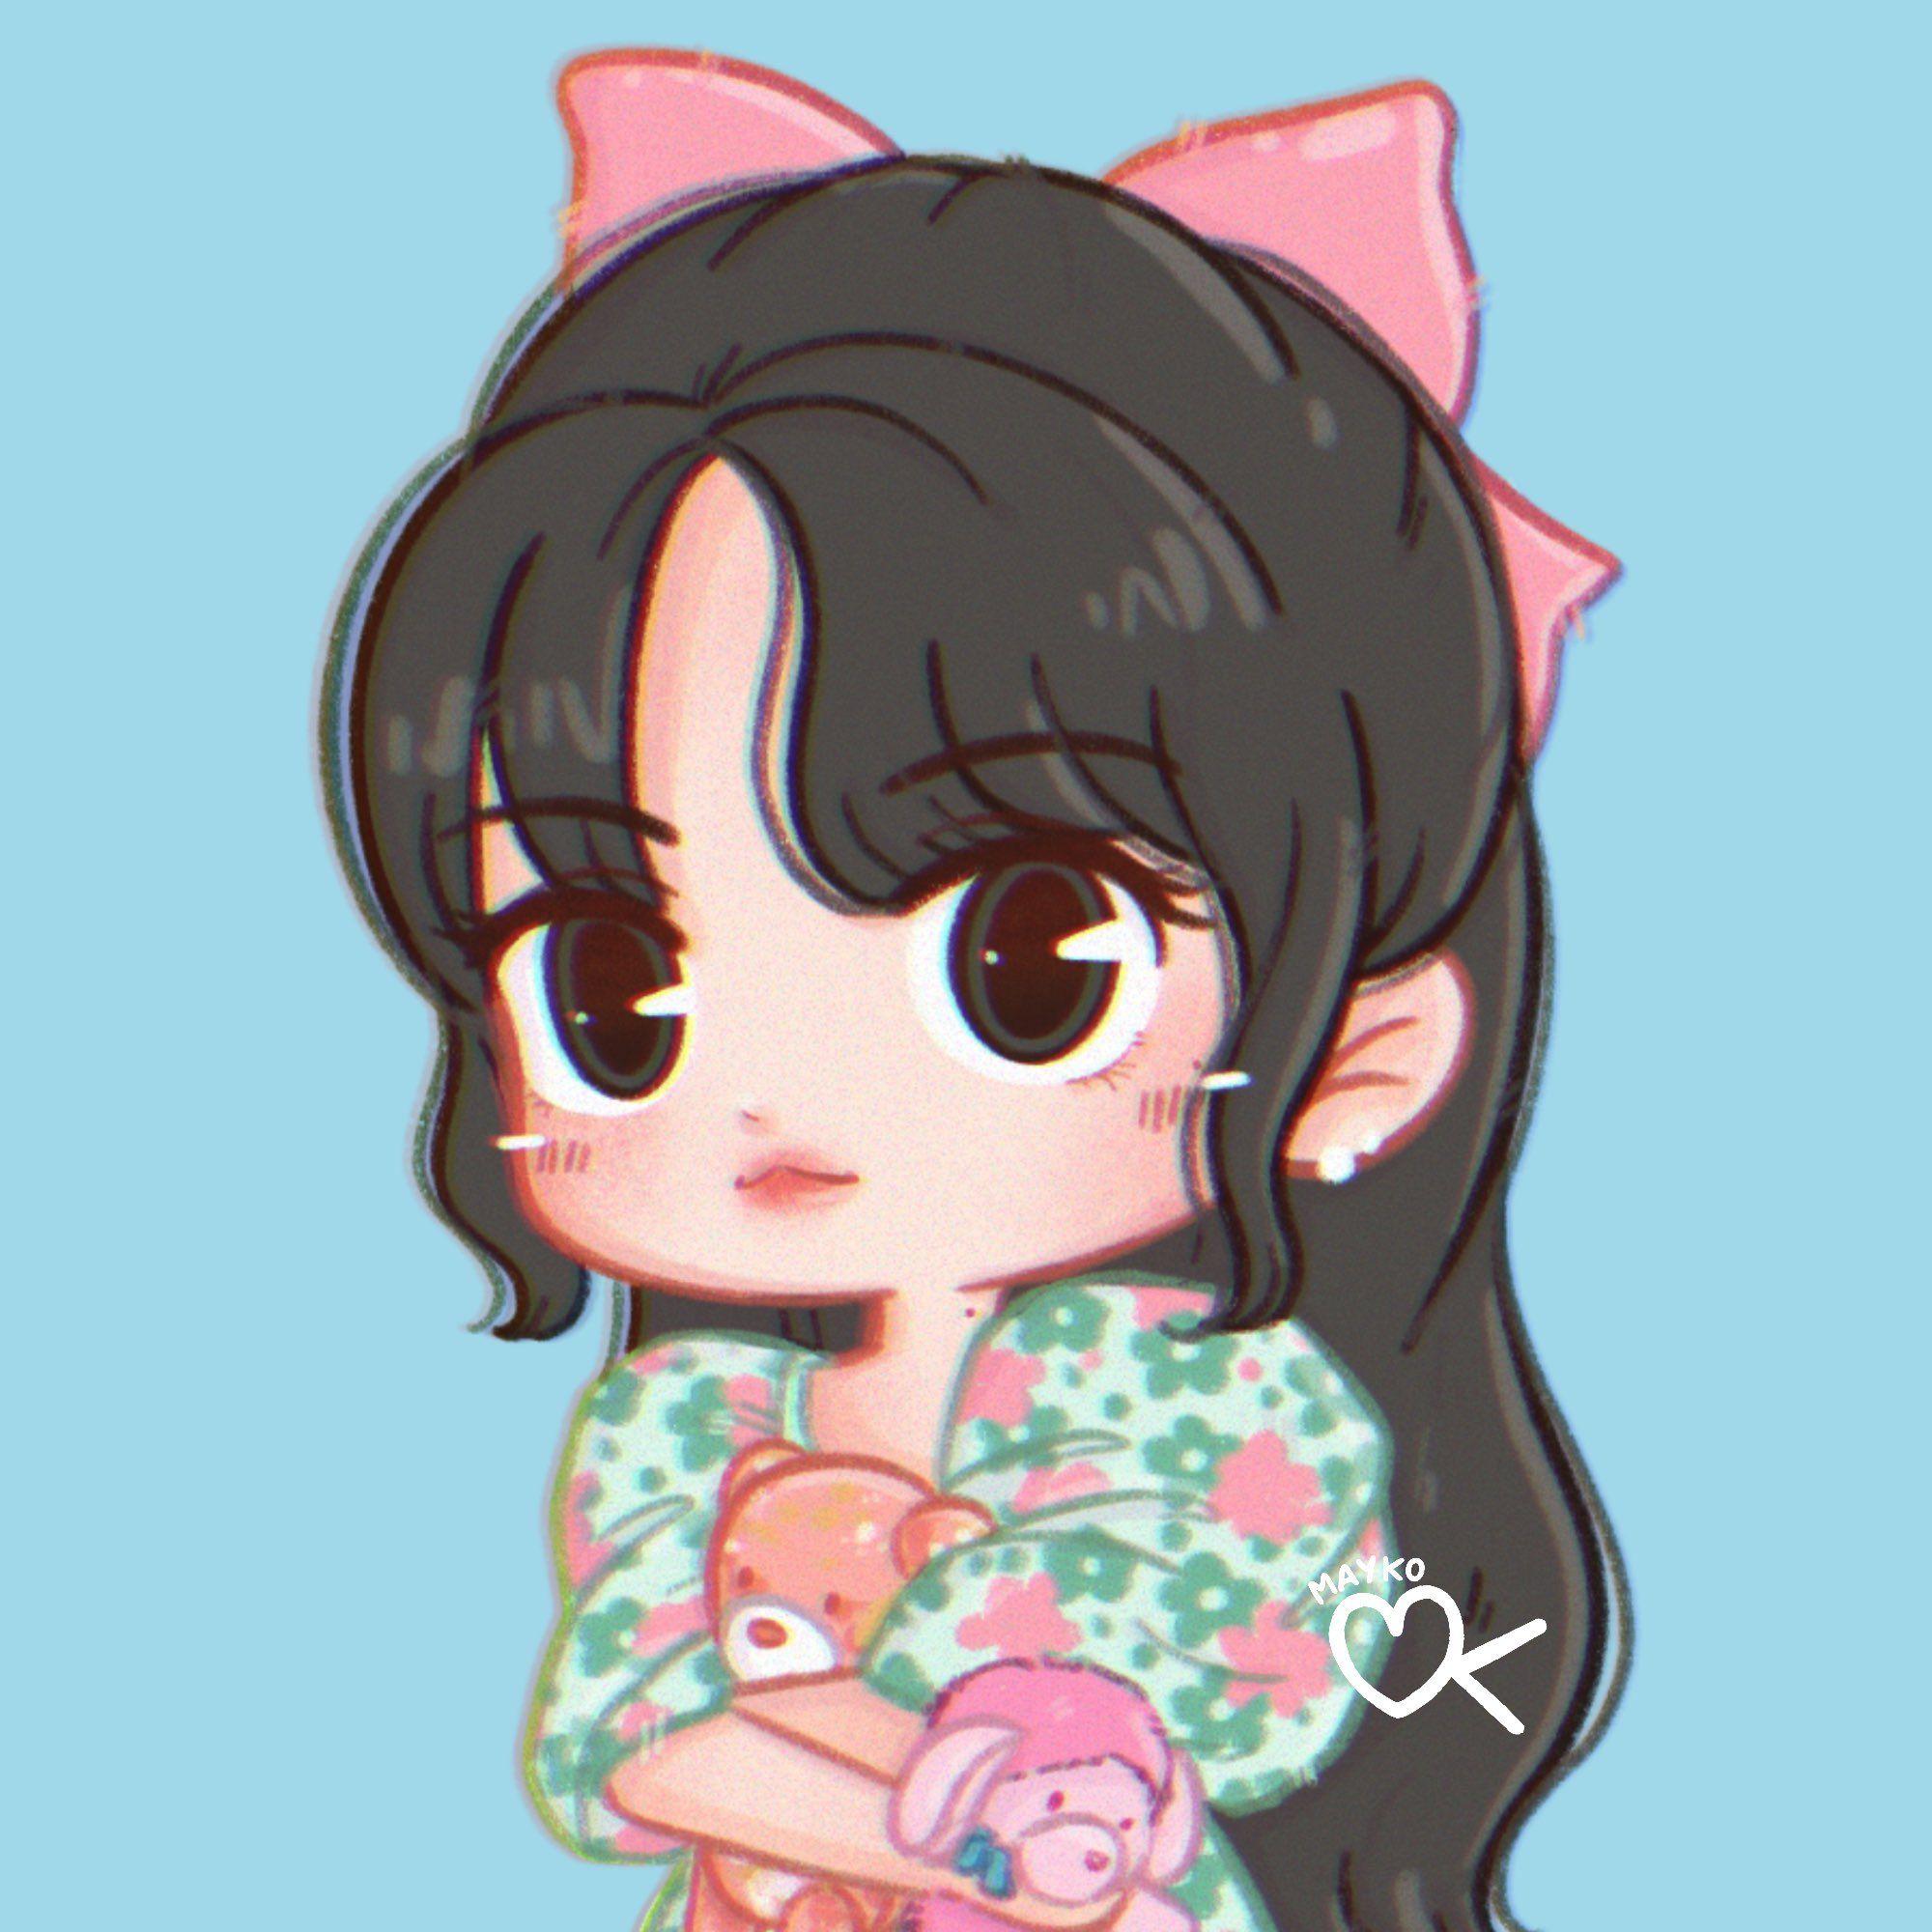 Mayko On Twitter In 2021 Chibi Girls Cartoon Art Cute Cartoon Wallpapers